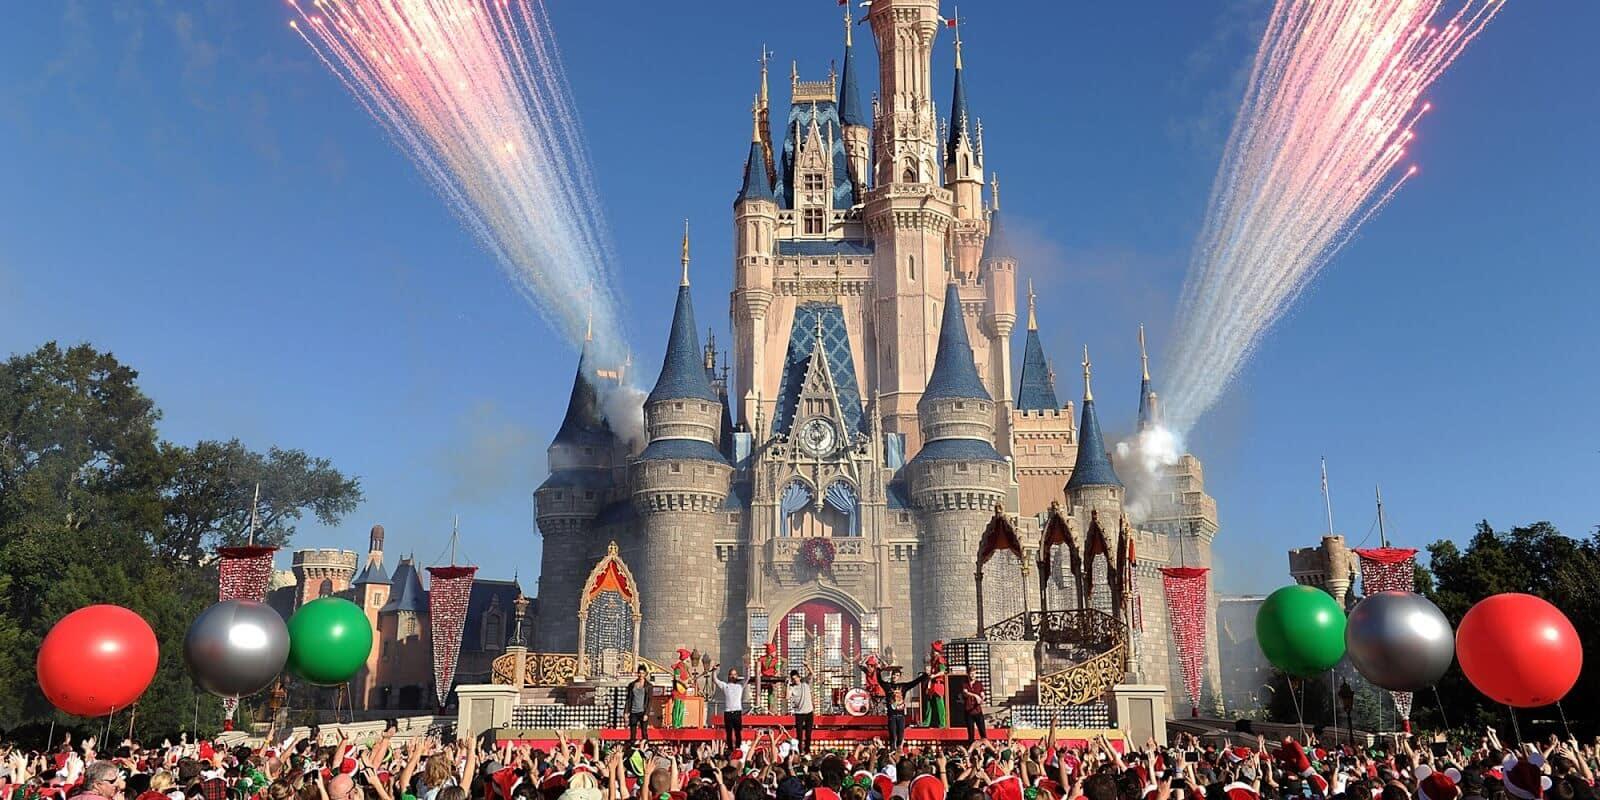 Disney Magic Kingdom theme park in Orlando